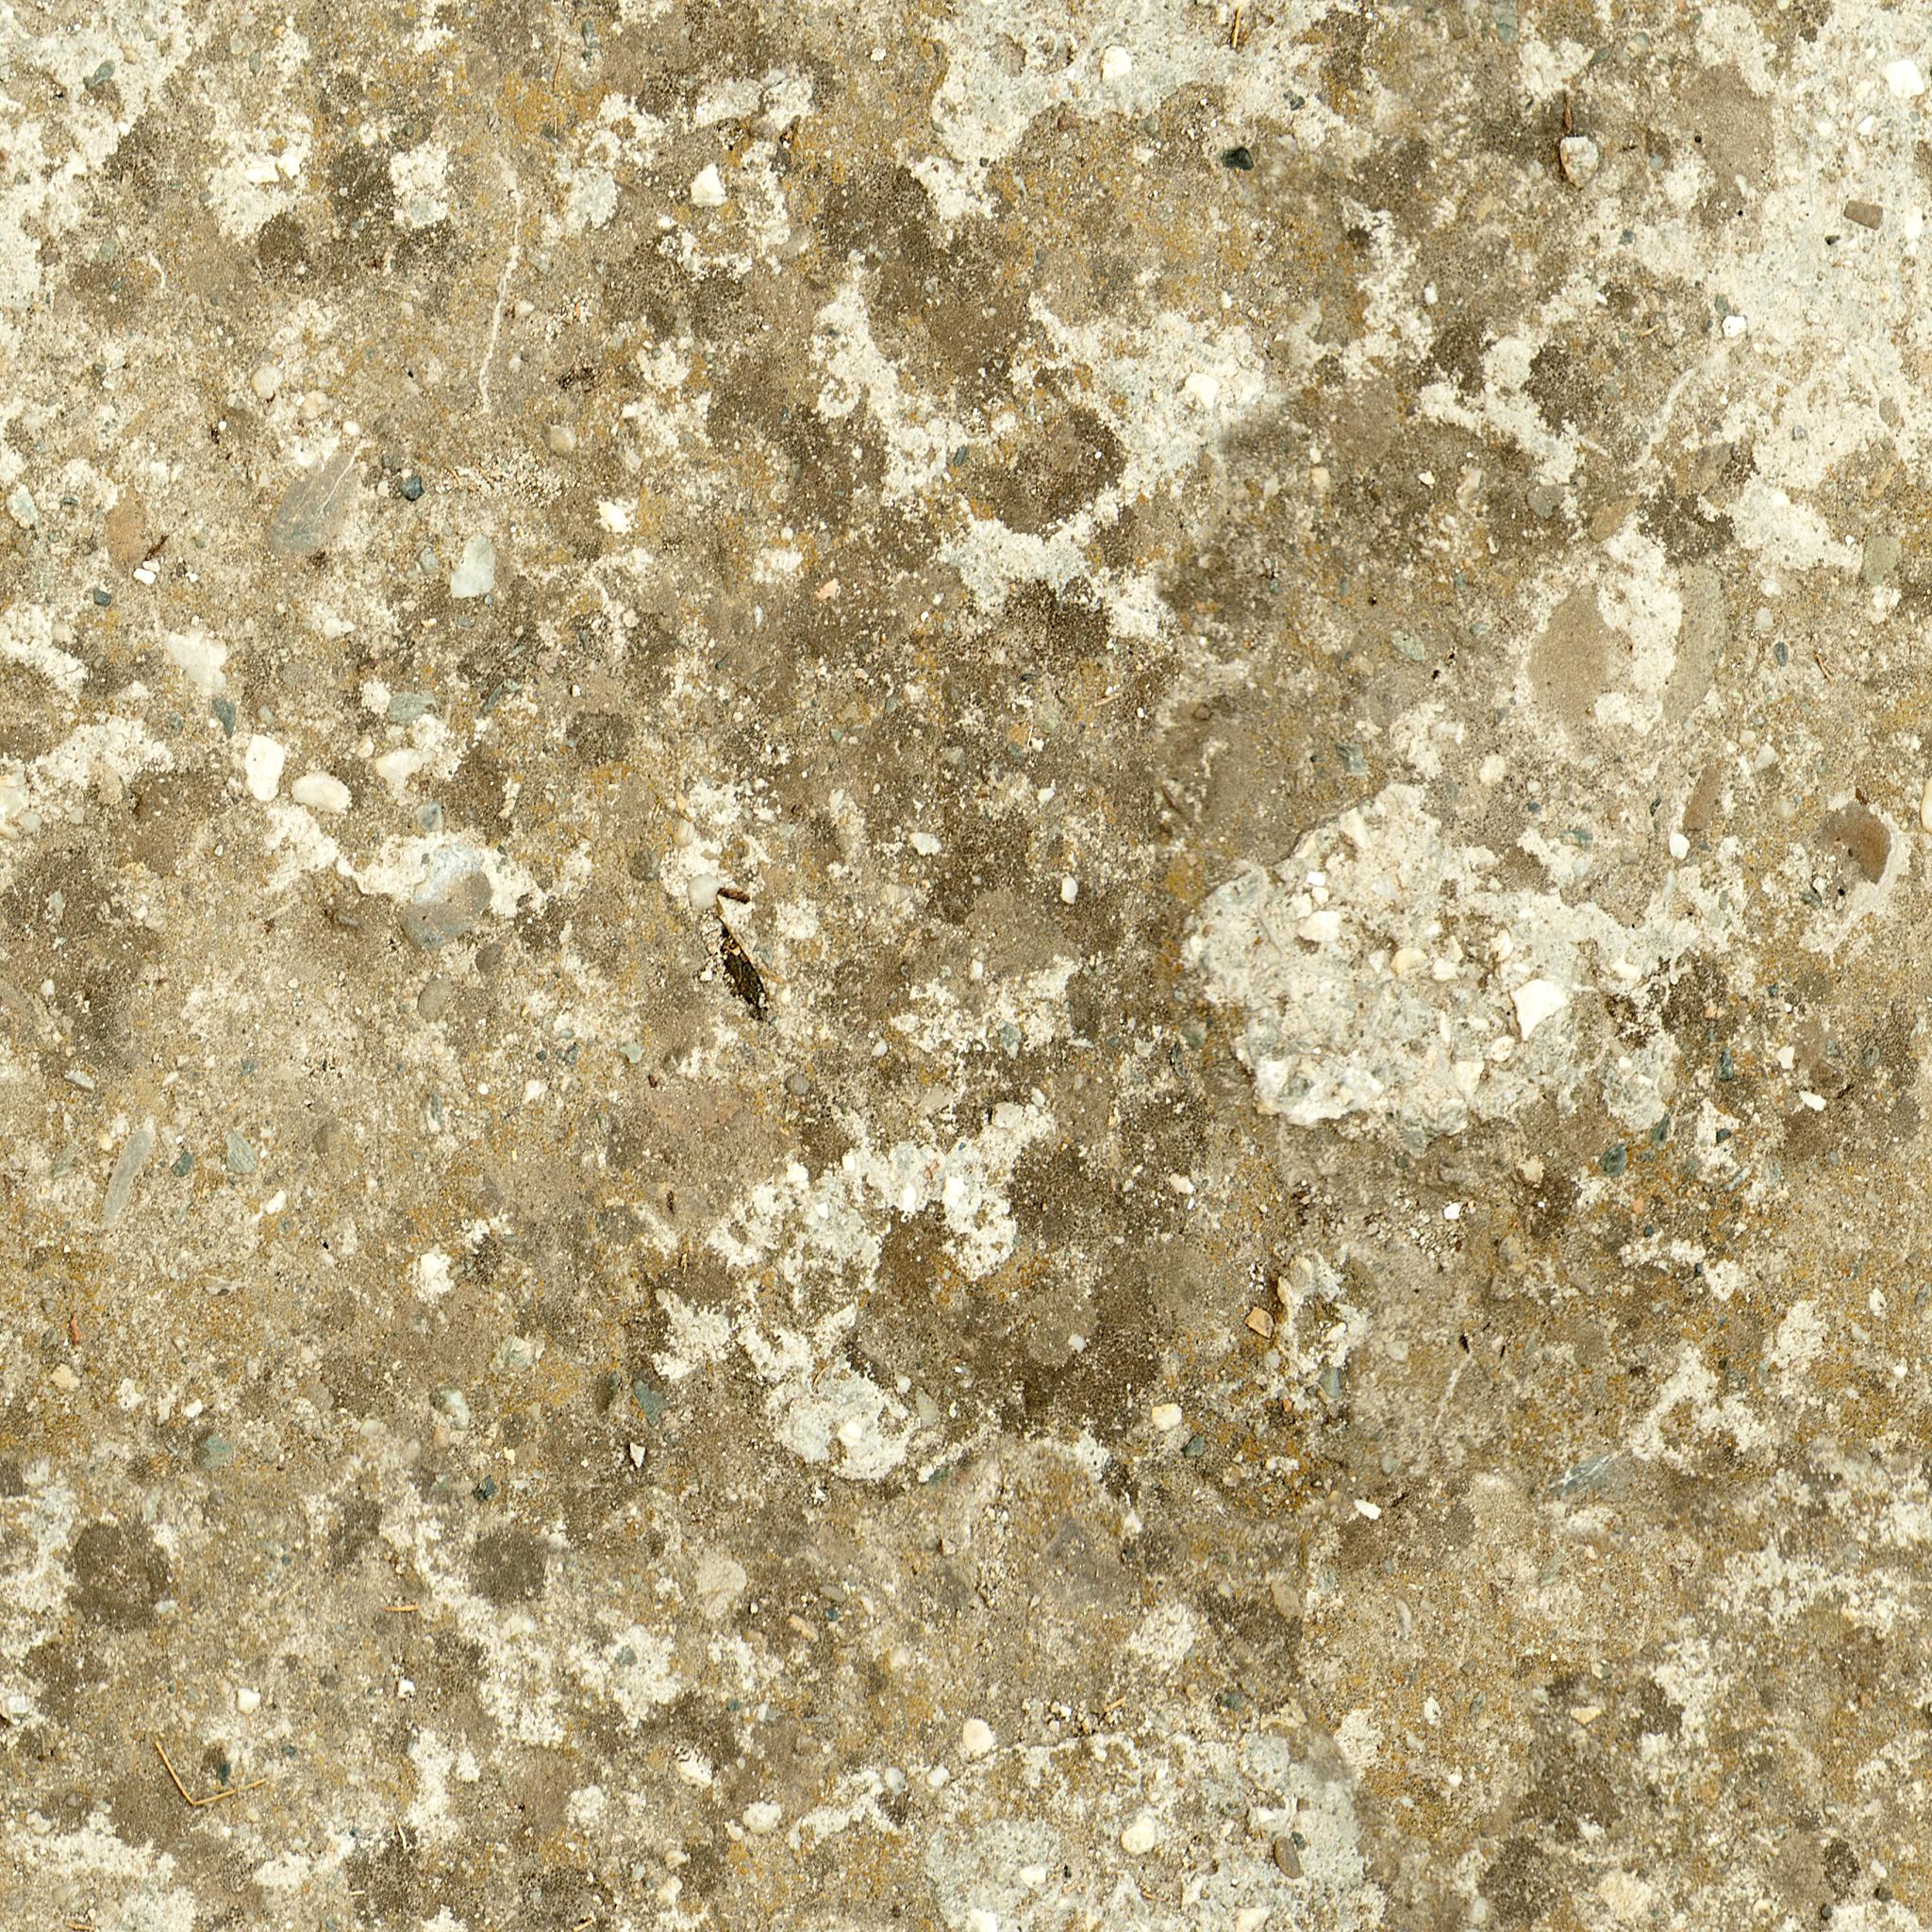 Brown Worn Course Concrete.jpg